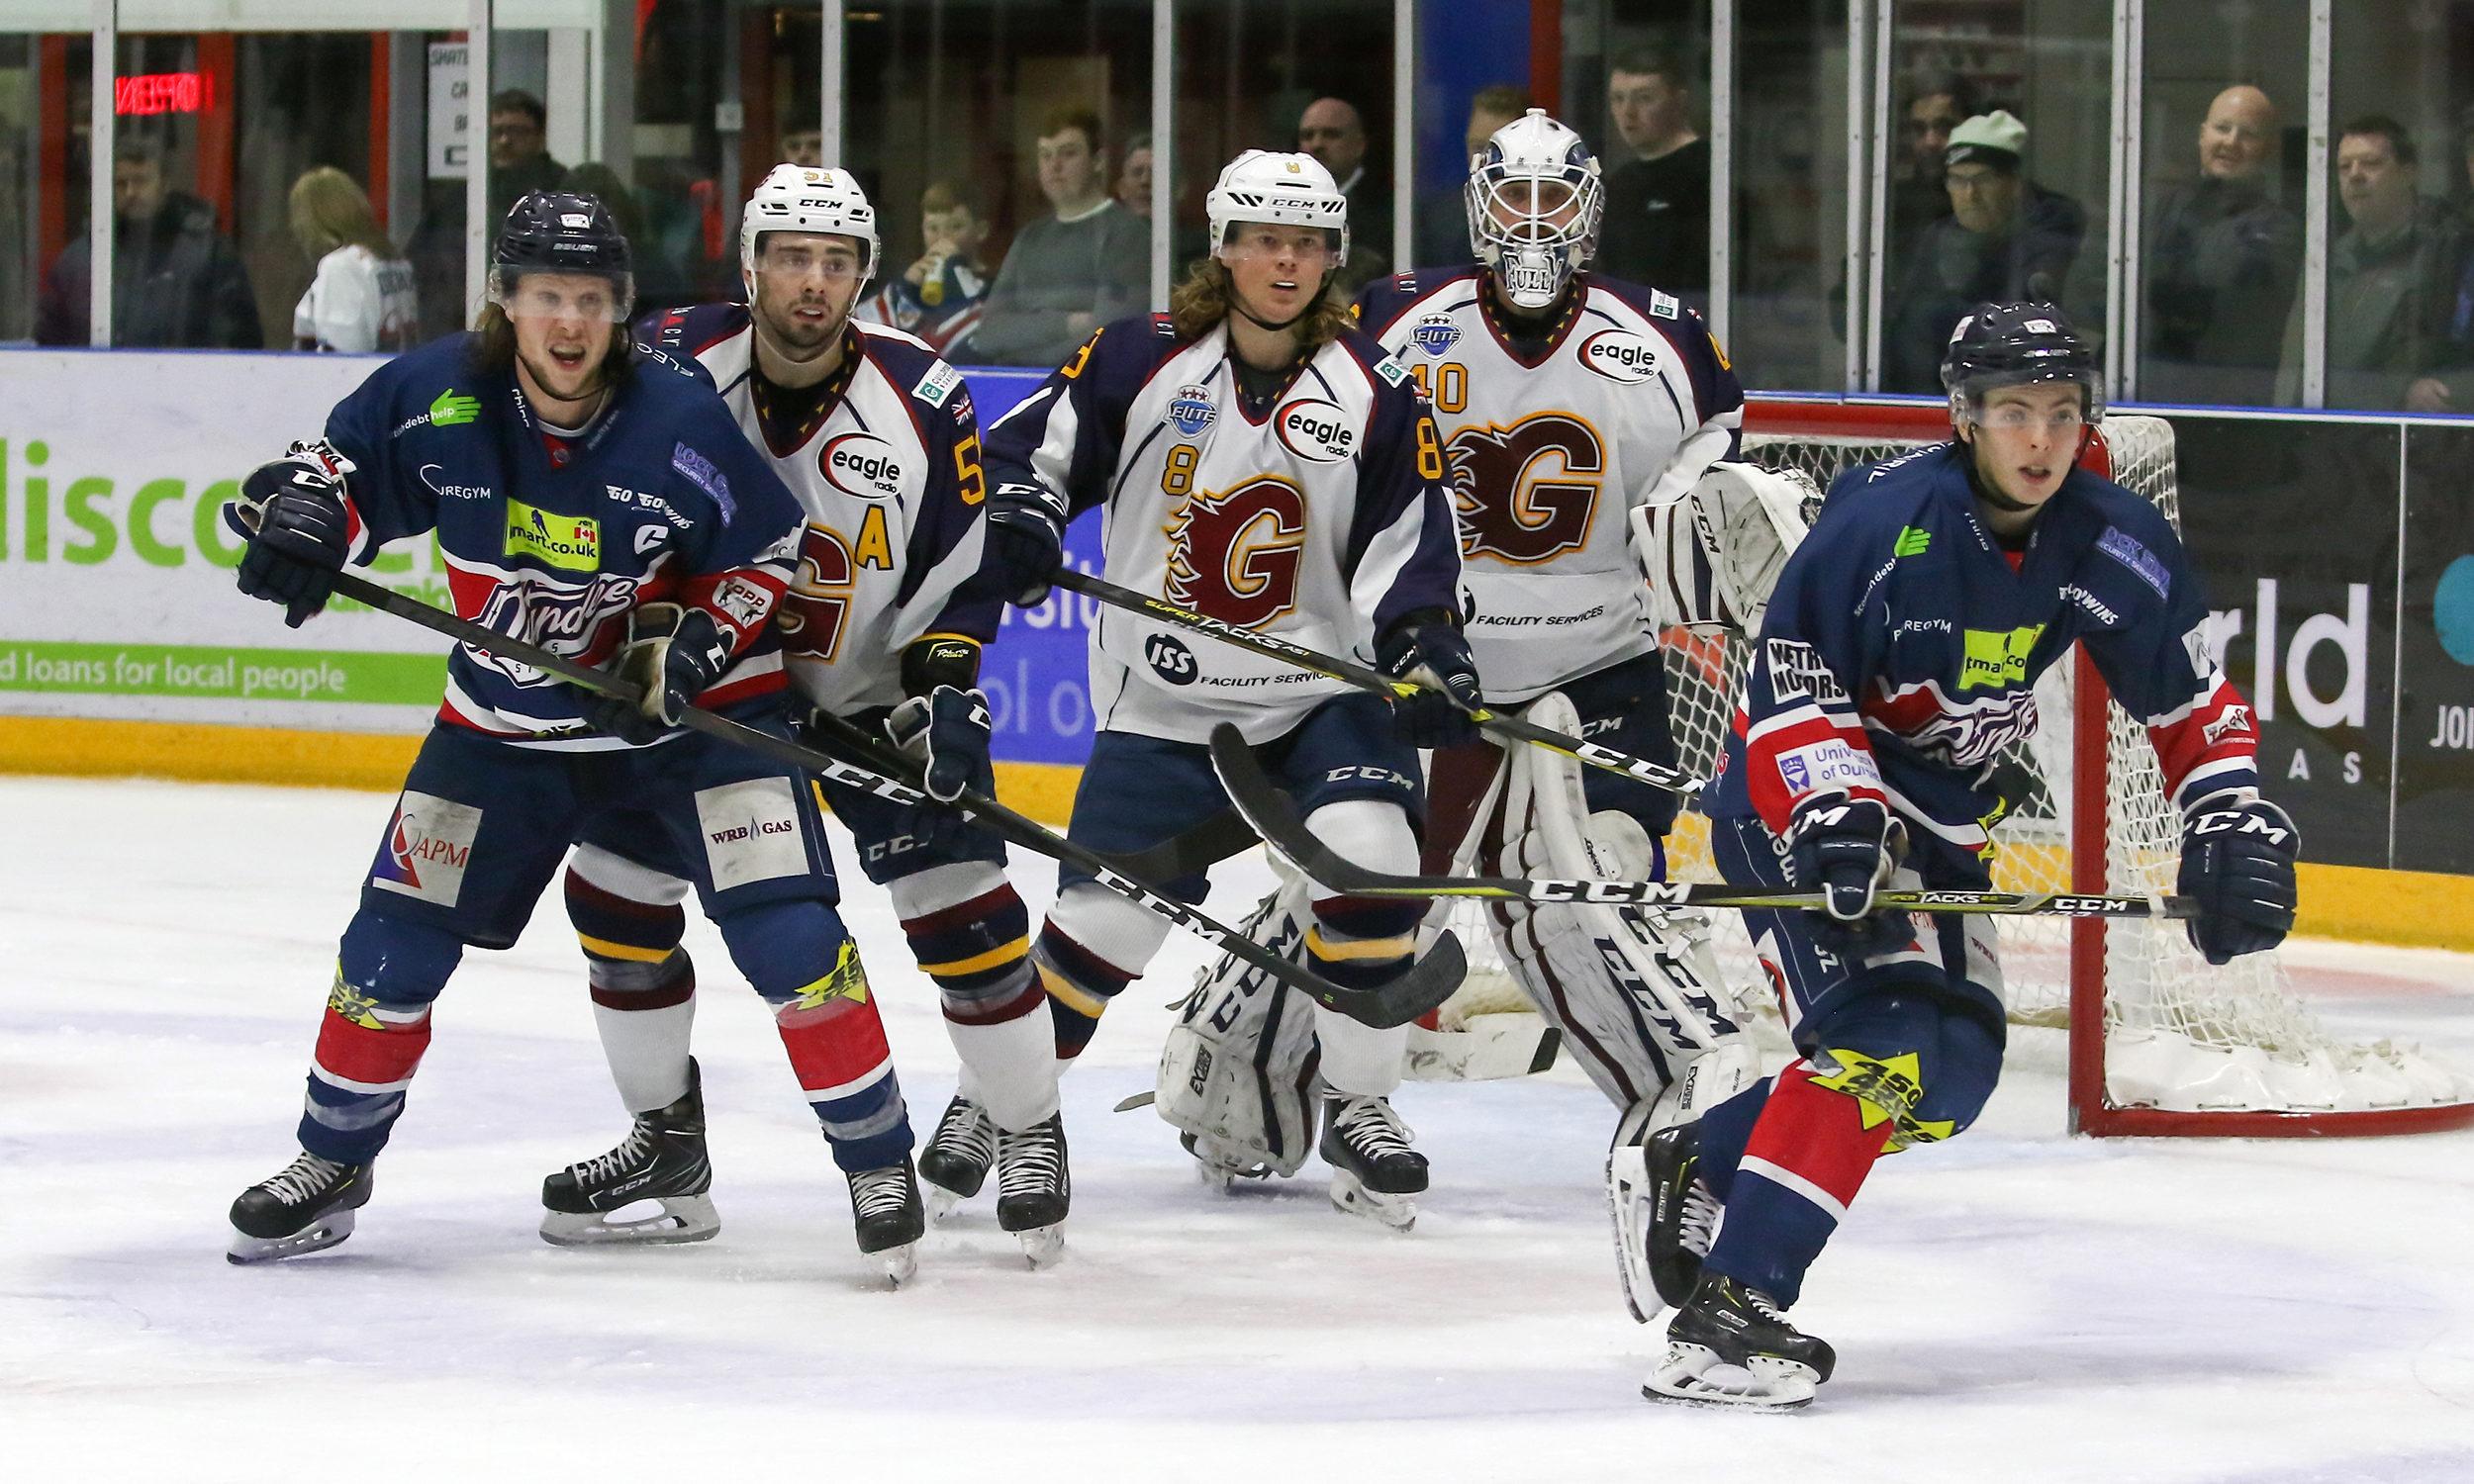 Stars Johan Andersson & Jordan Kelsall attack the Flames goal.